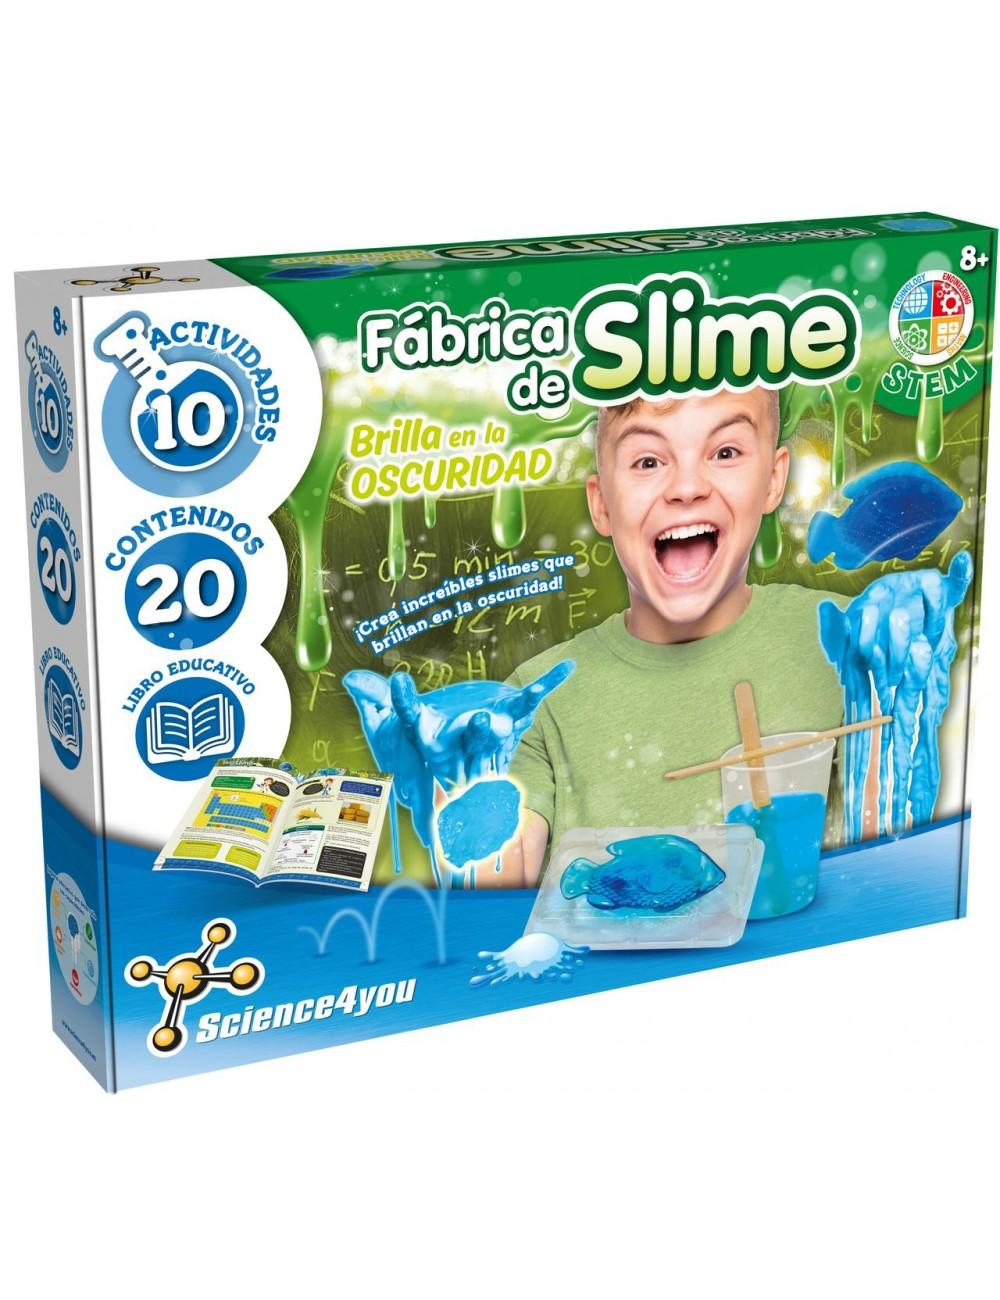 Kit de Slime - Fábrica de Slime